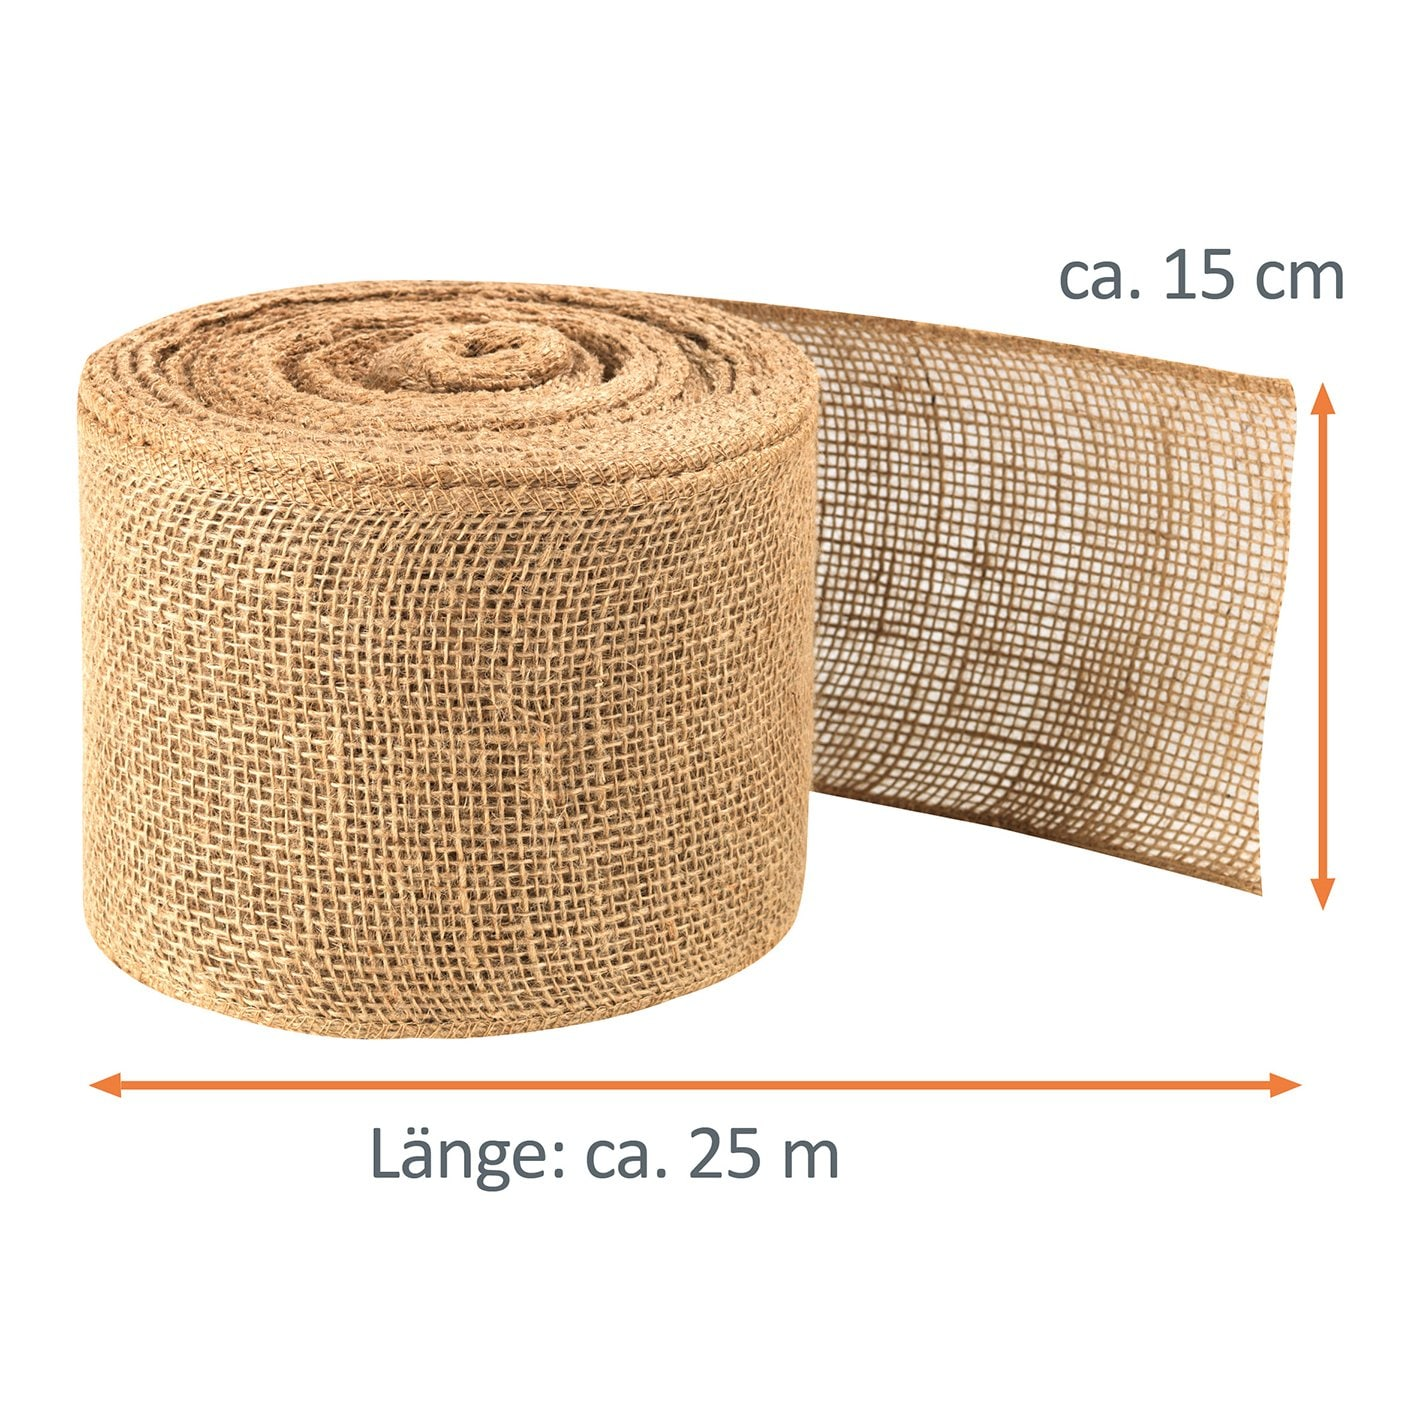 PRIMA GARDEN robustes Jute-Wickelband - ca. 25 m x 15 cm